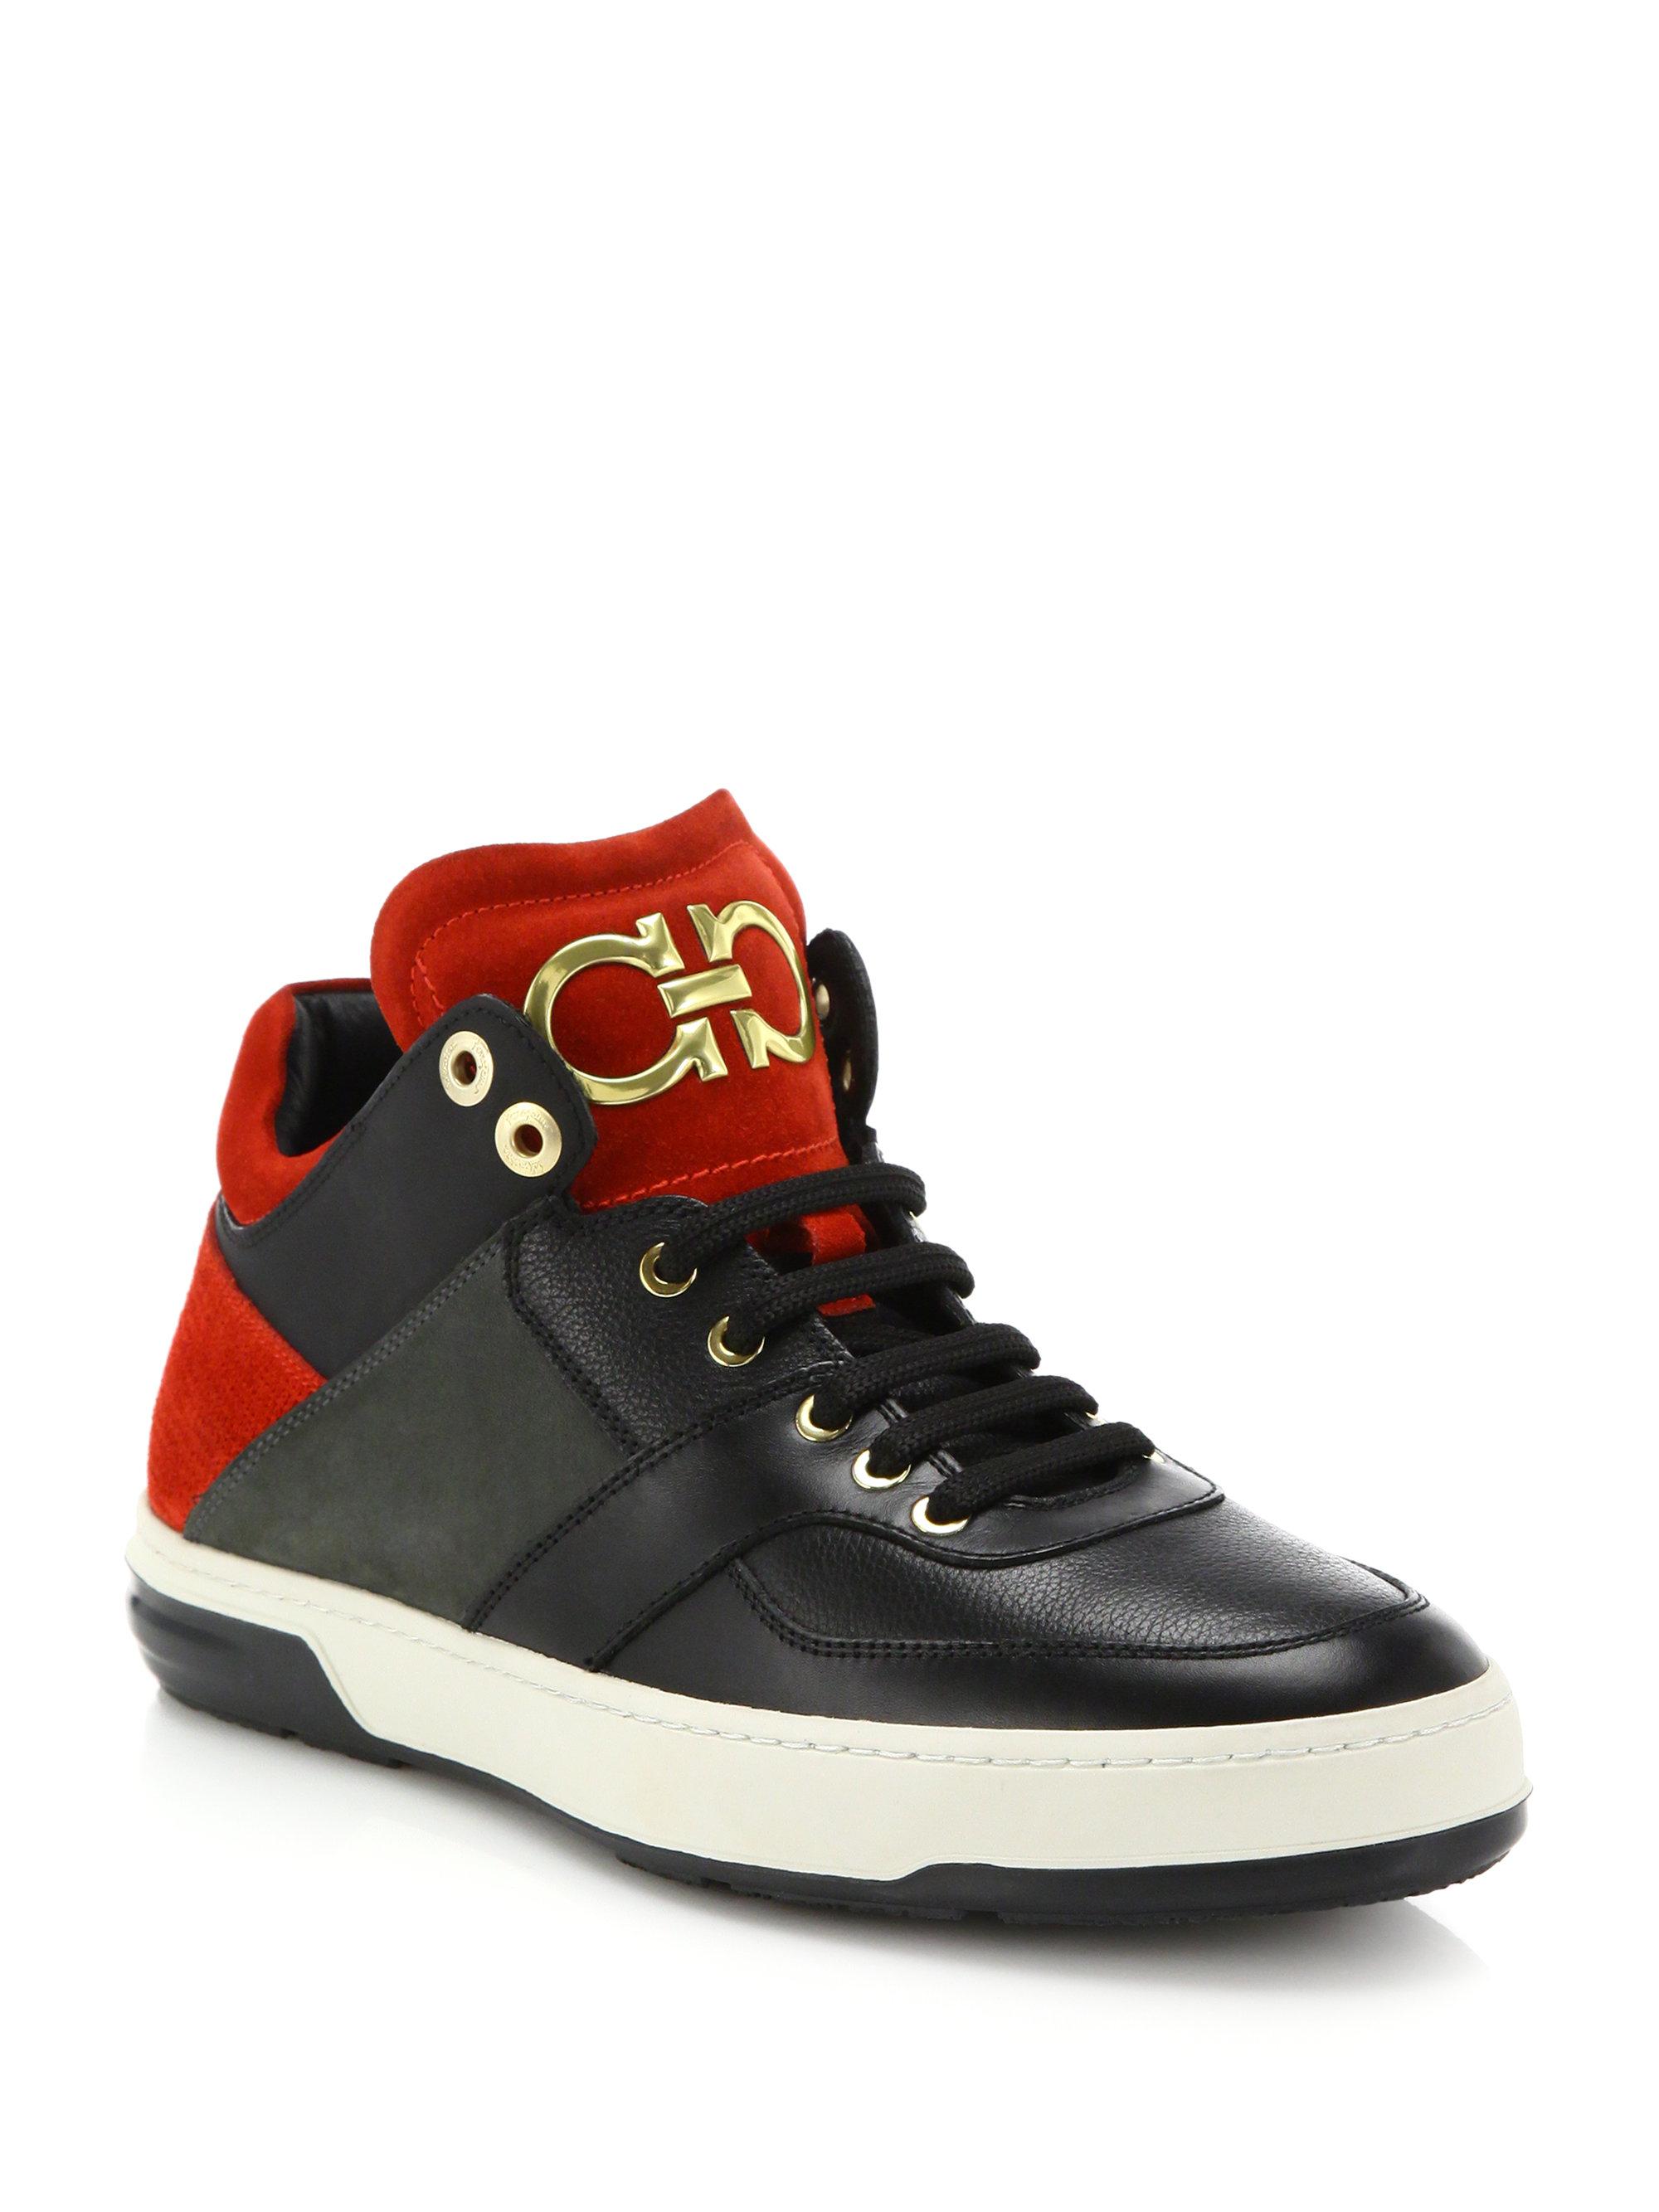 0a9d4c4e5f48b Lyst - Ferragamo Monroe High-top Sneakers in Black for Men